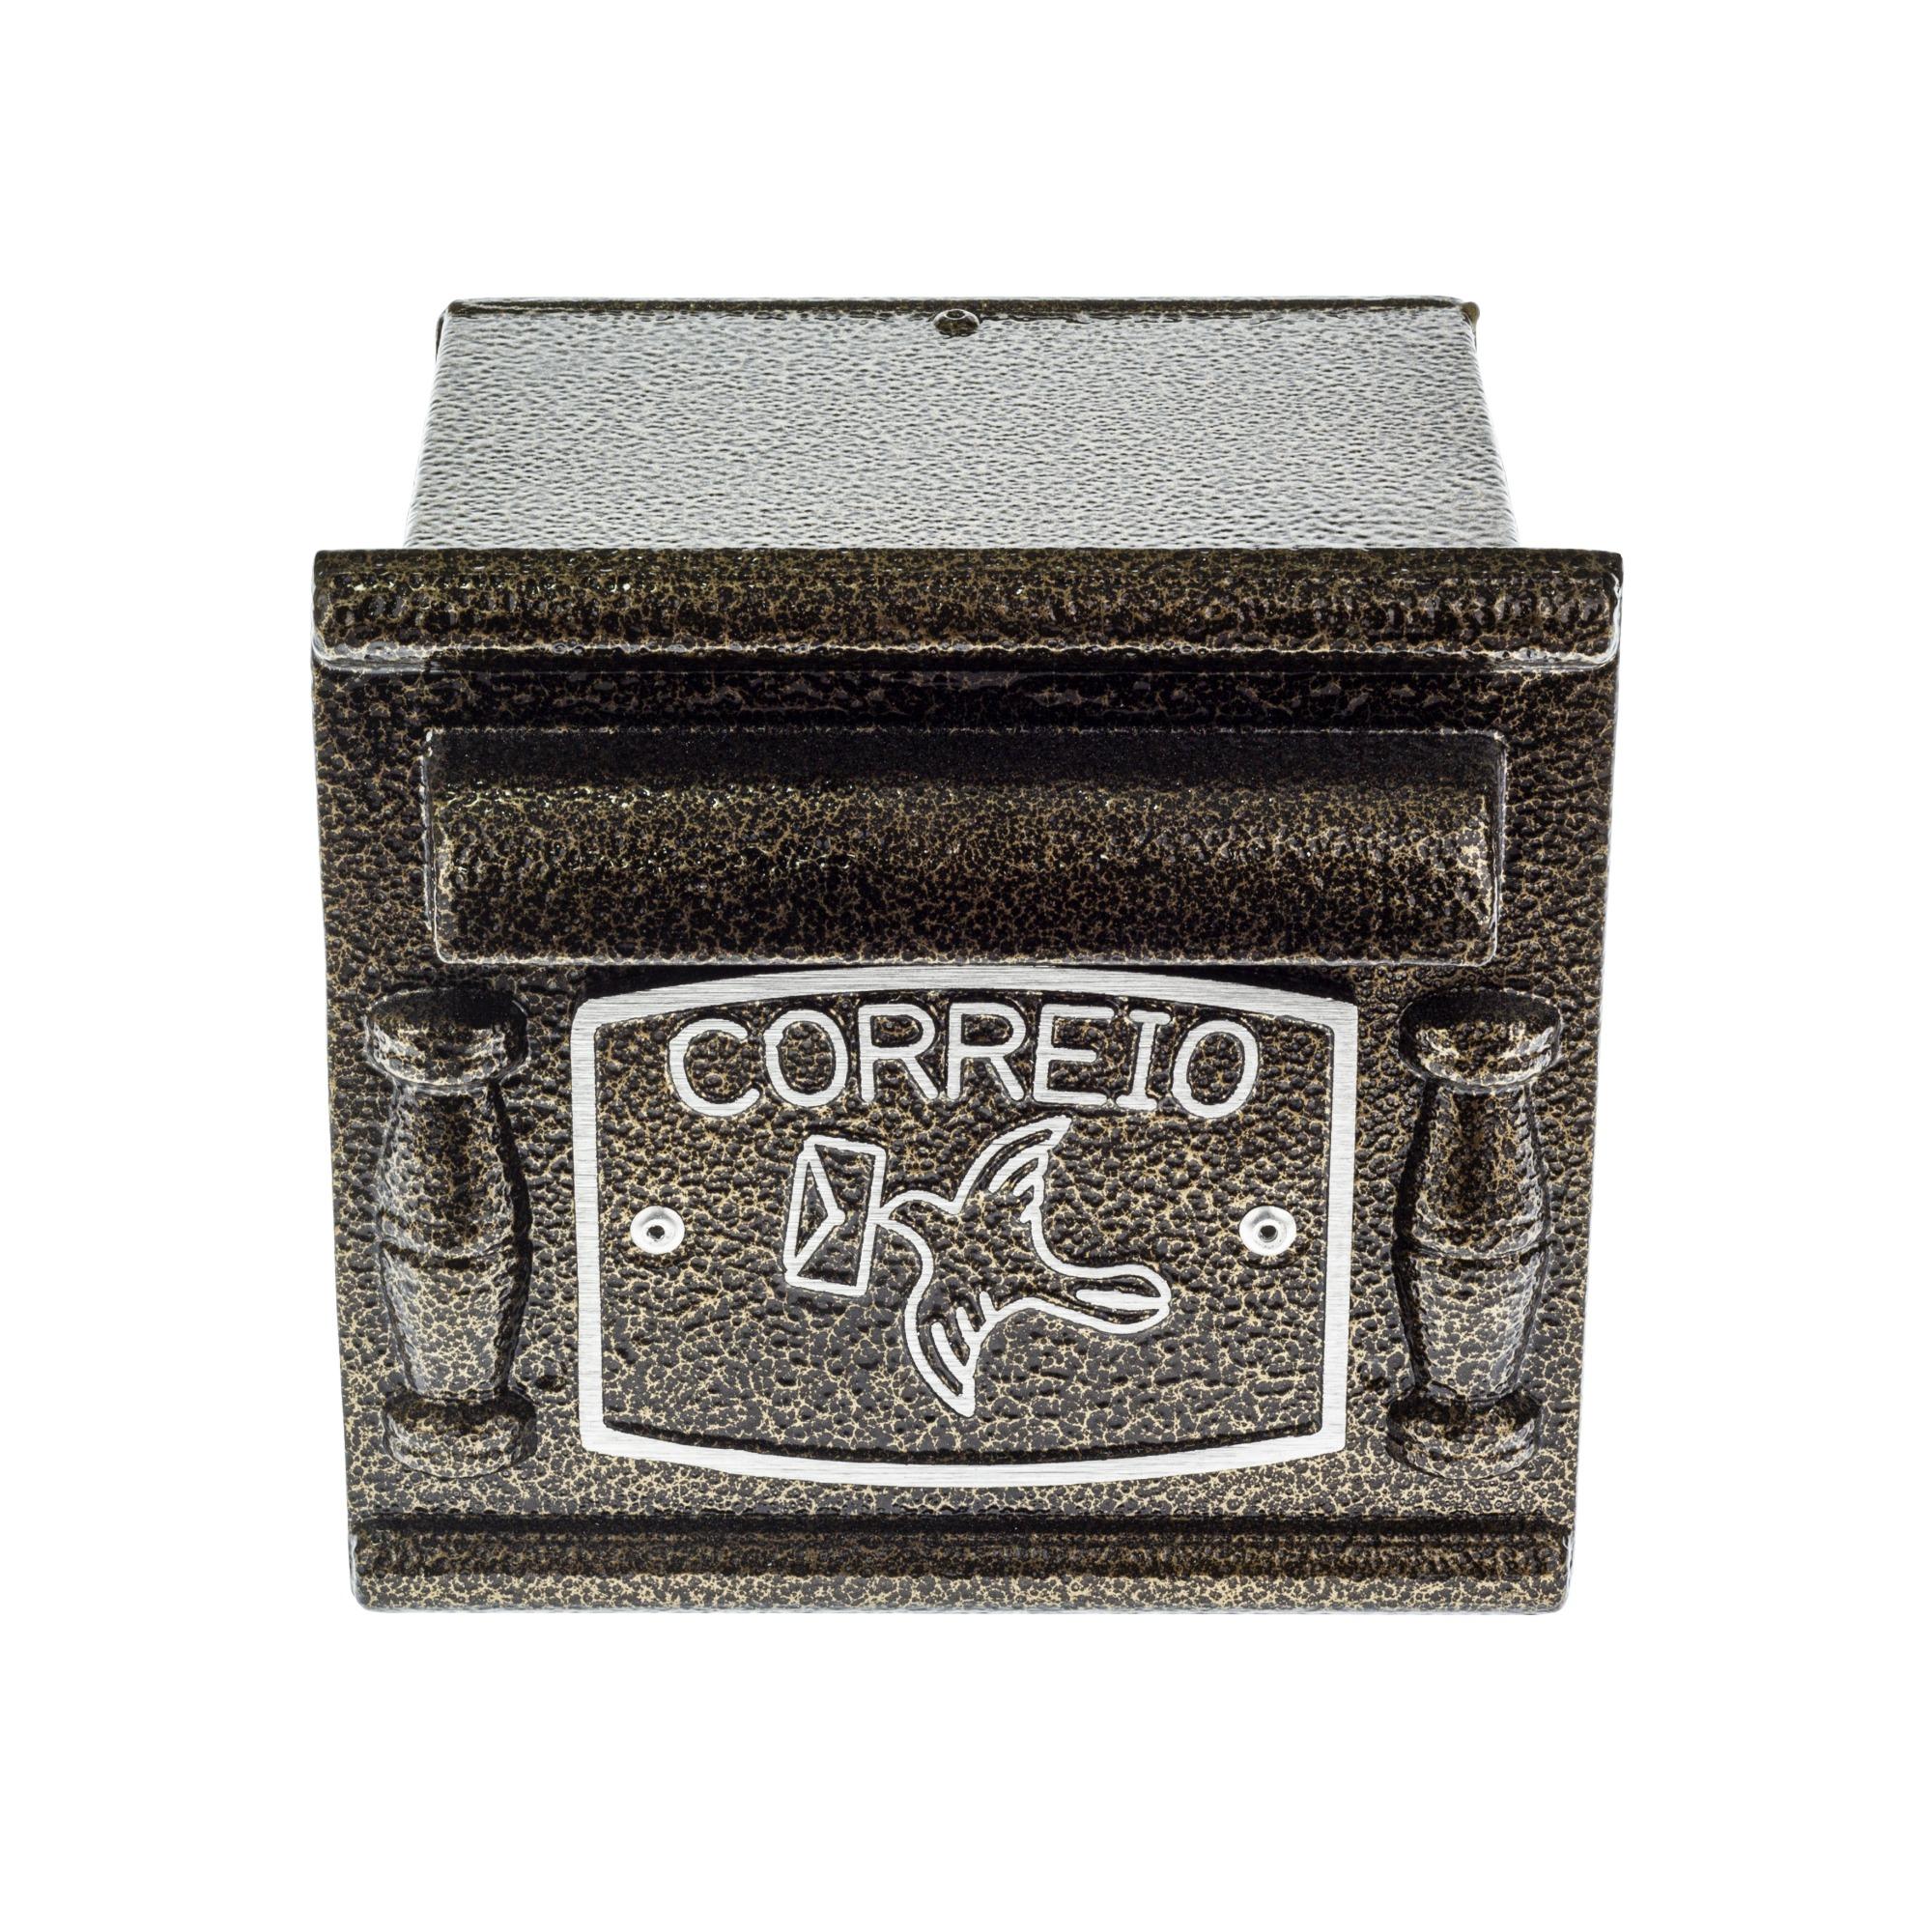 Porta-cartas Aluminio 15x17 cm Depop Bronze - Prates e Barbosa